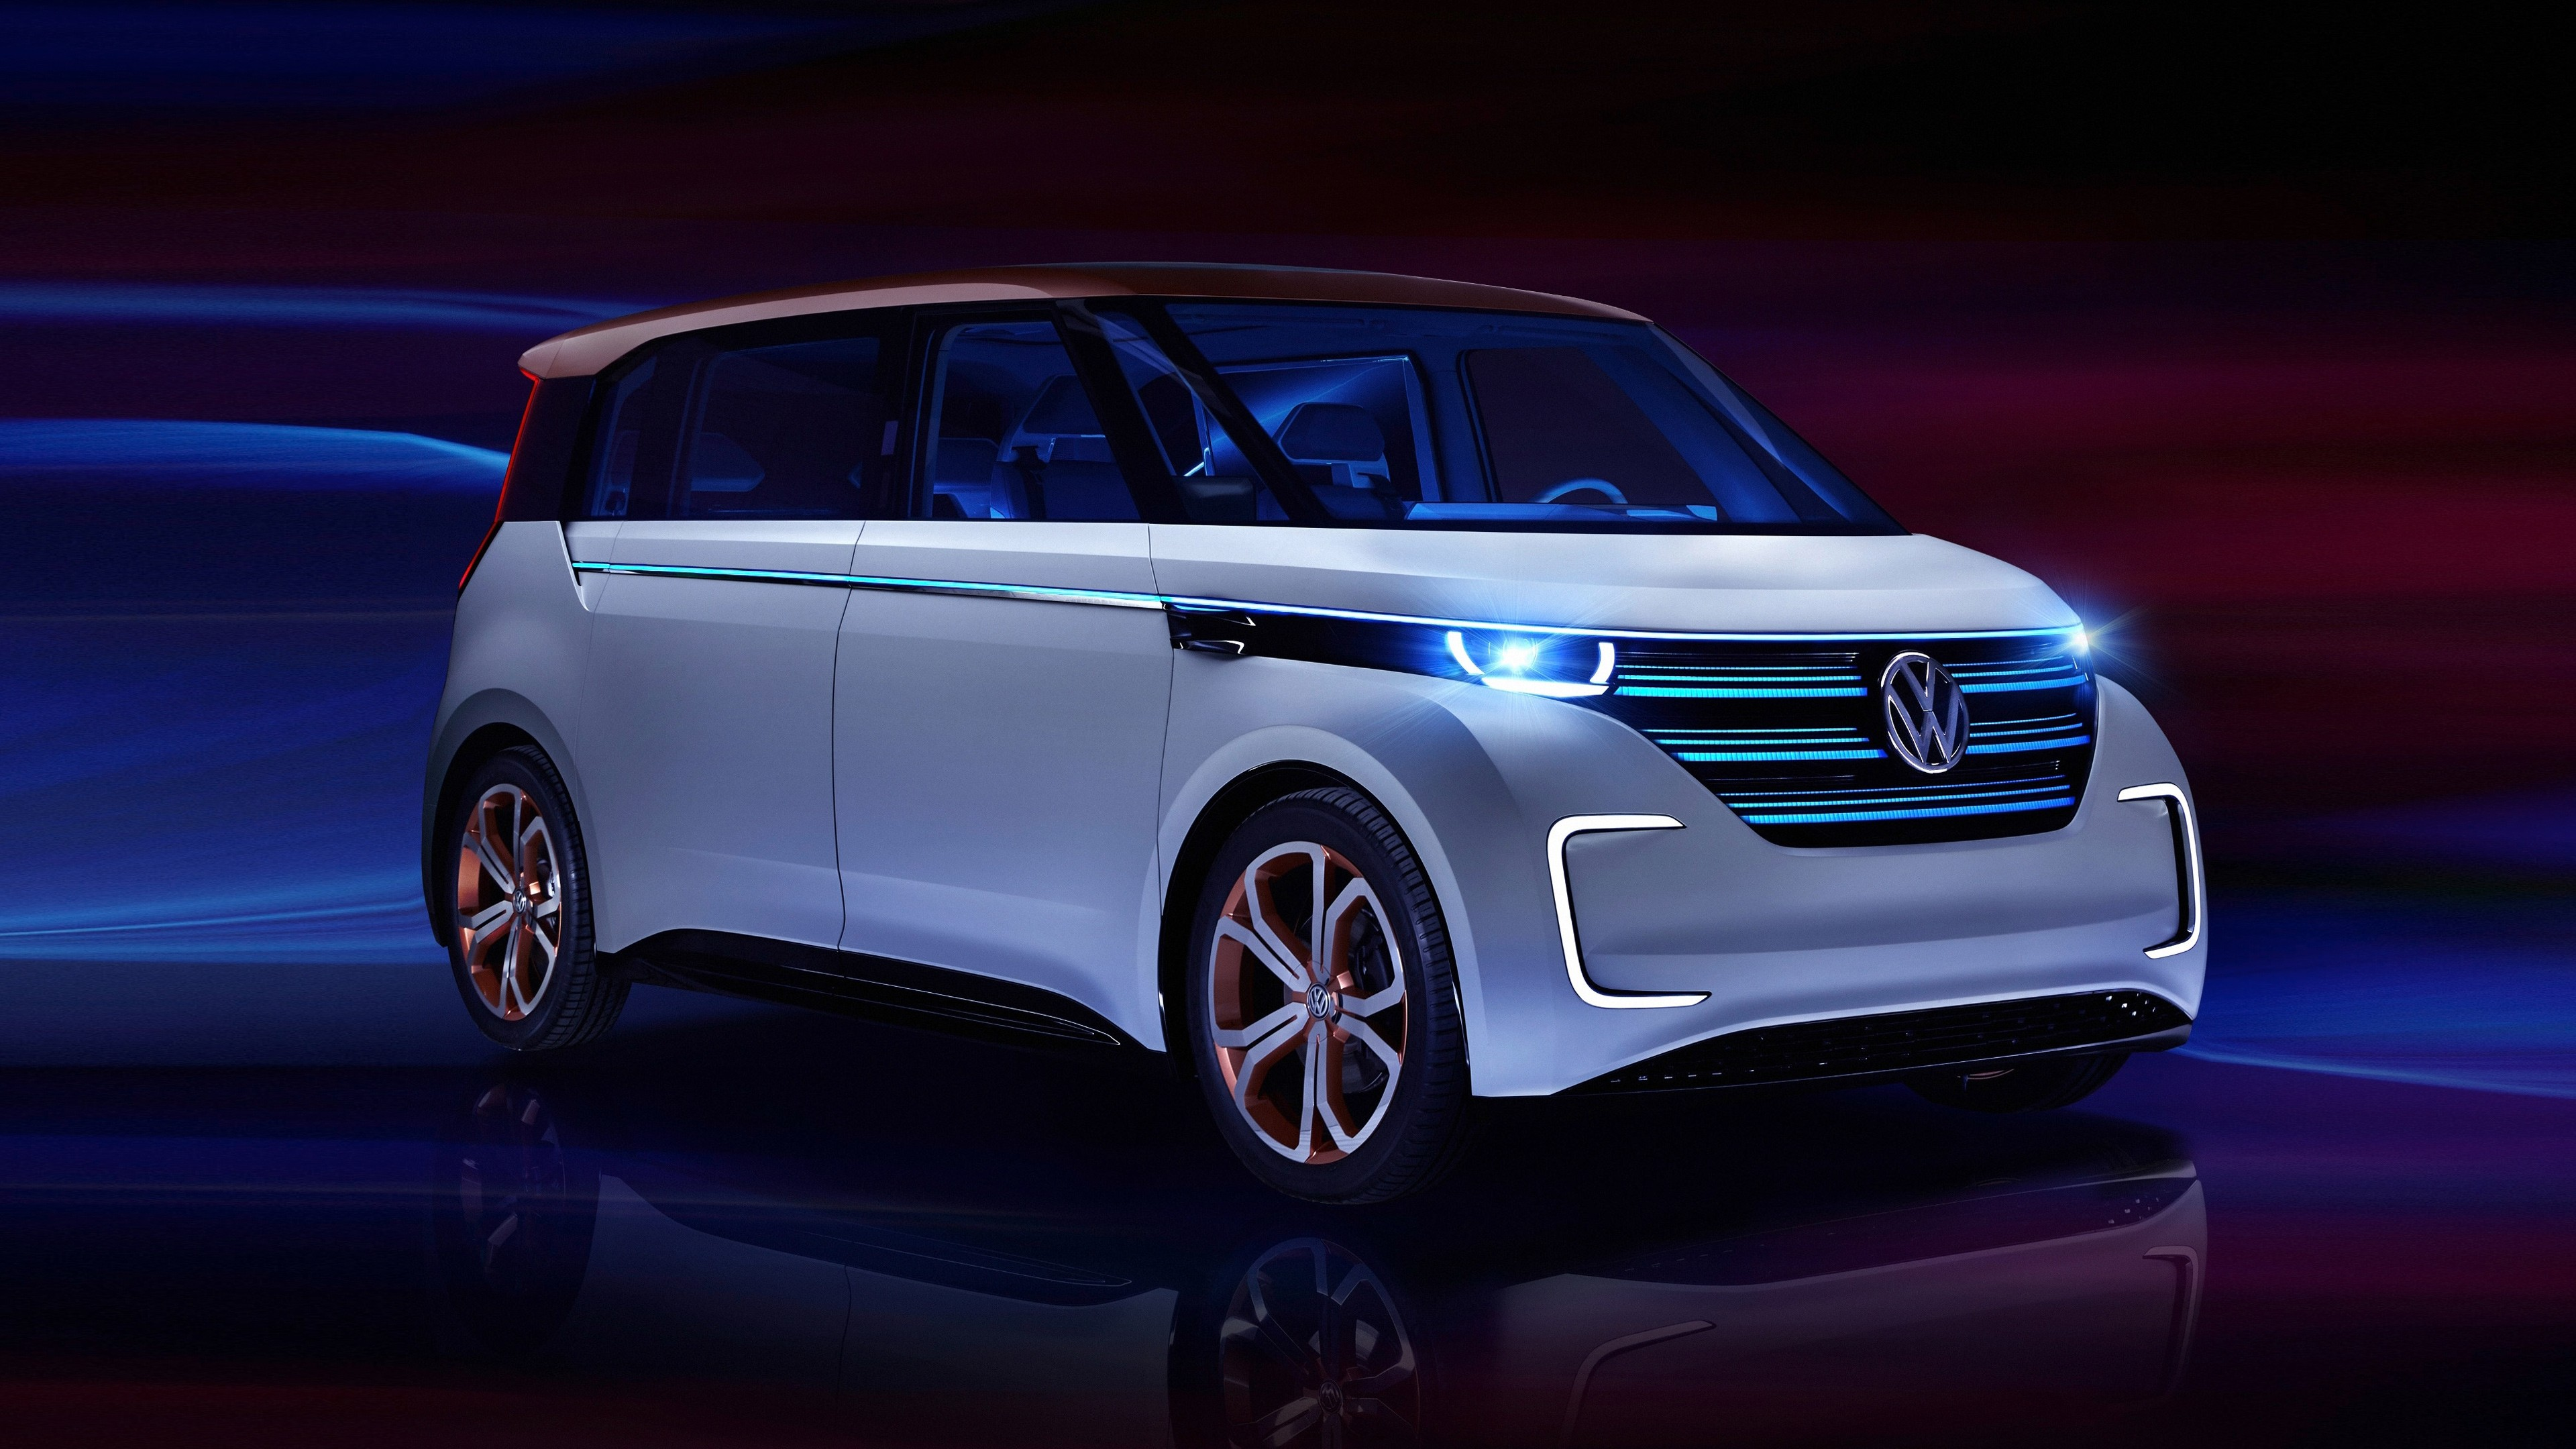 Volkswagen BUDD E Electric Car 4K Wallpaper